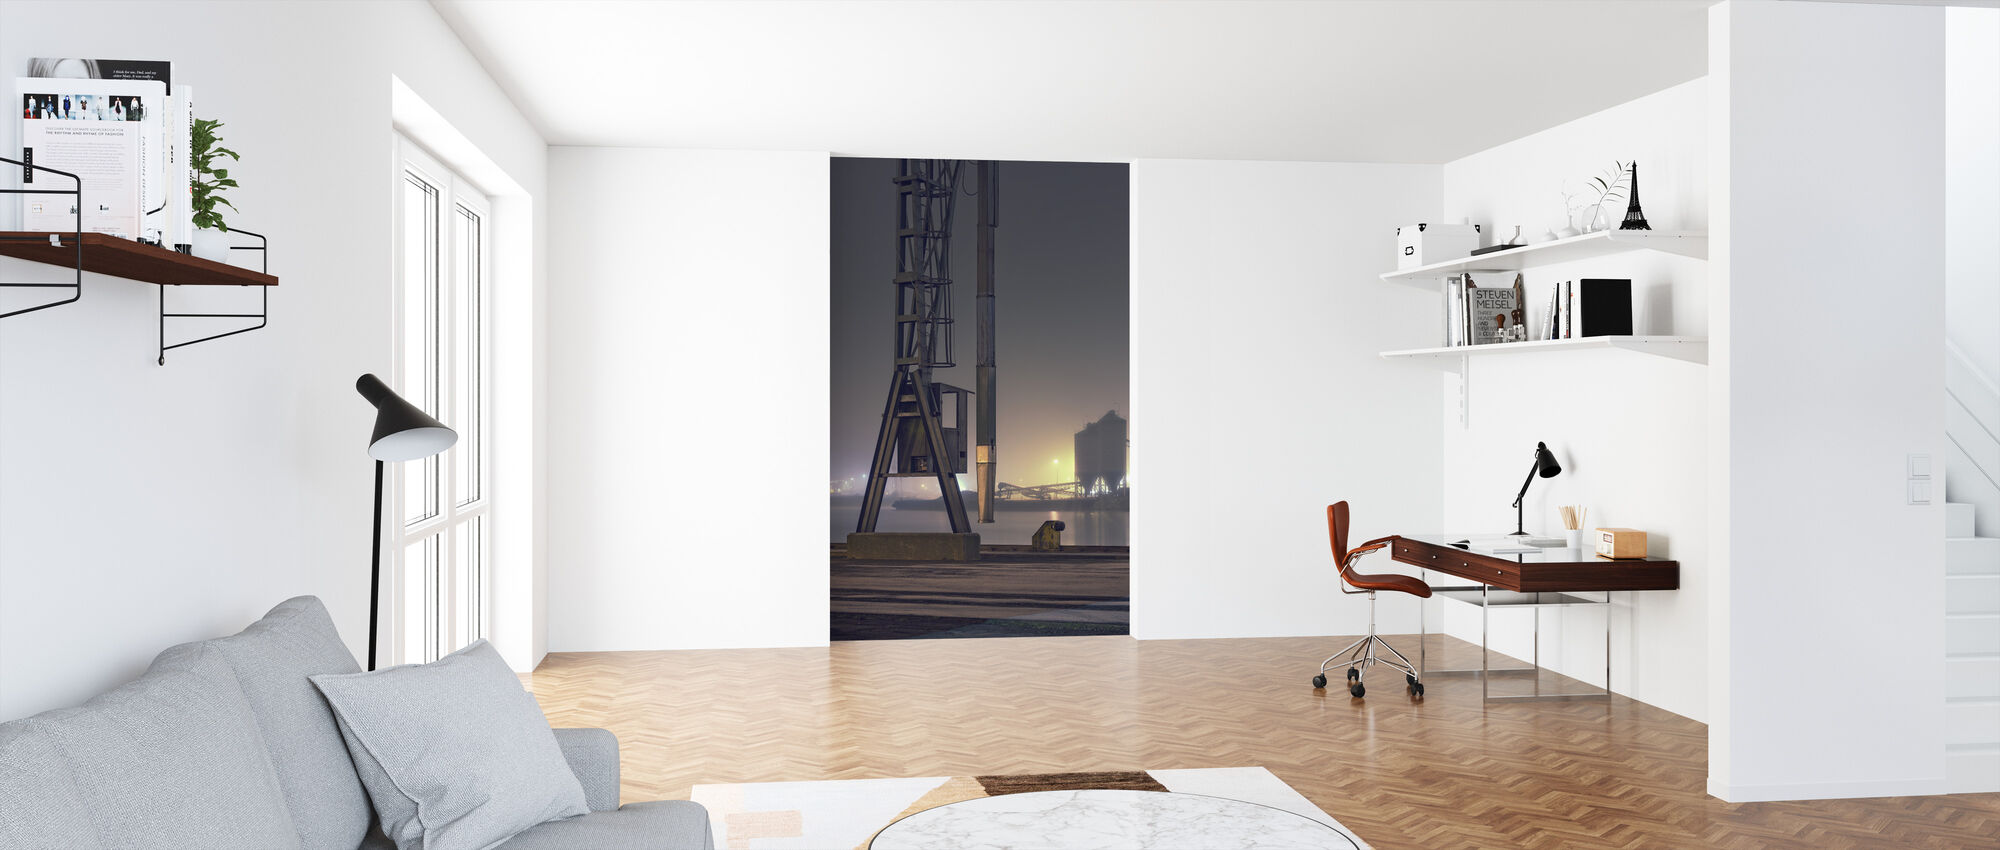 Foggy Harbour in Malmö, Sweden - Wallpaper - Office